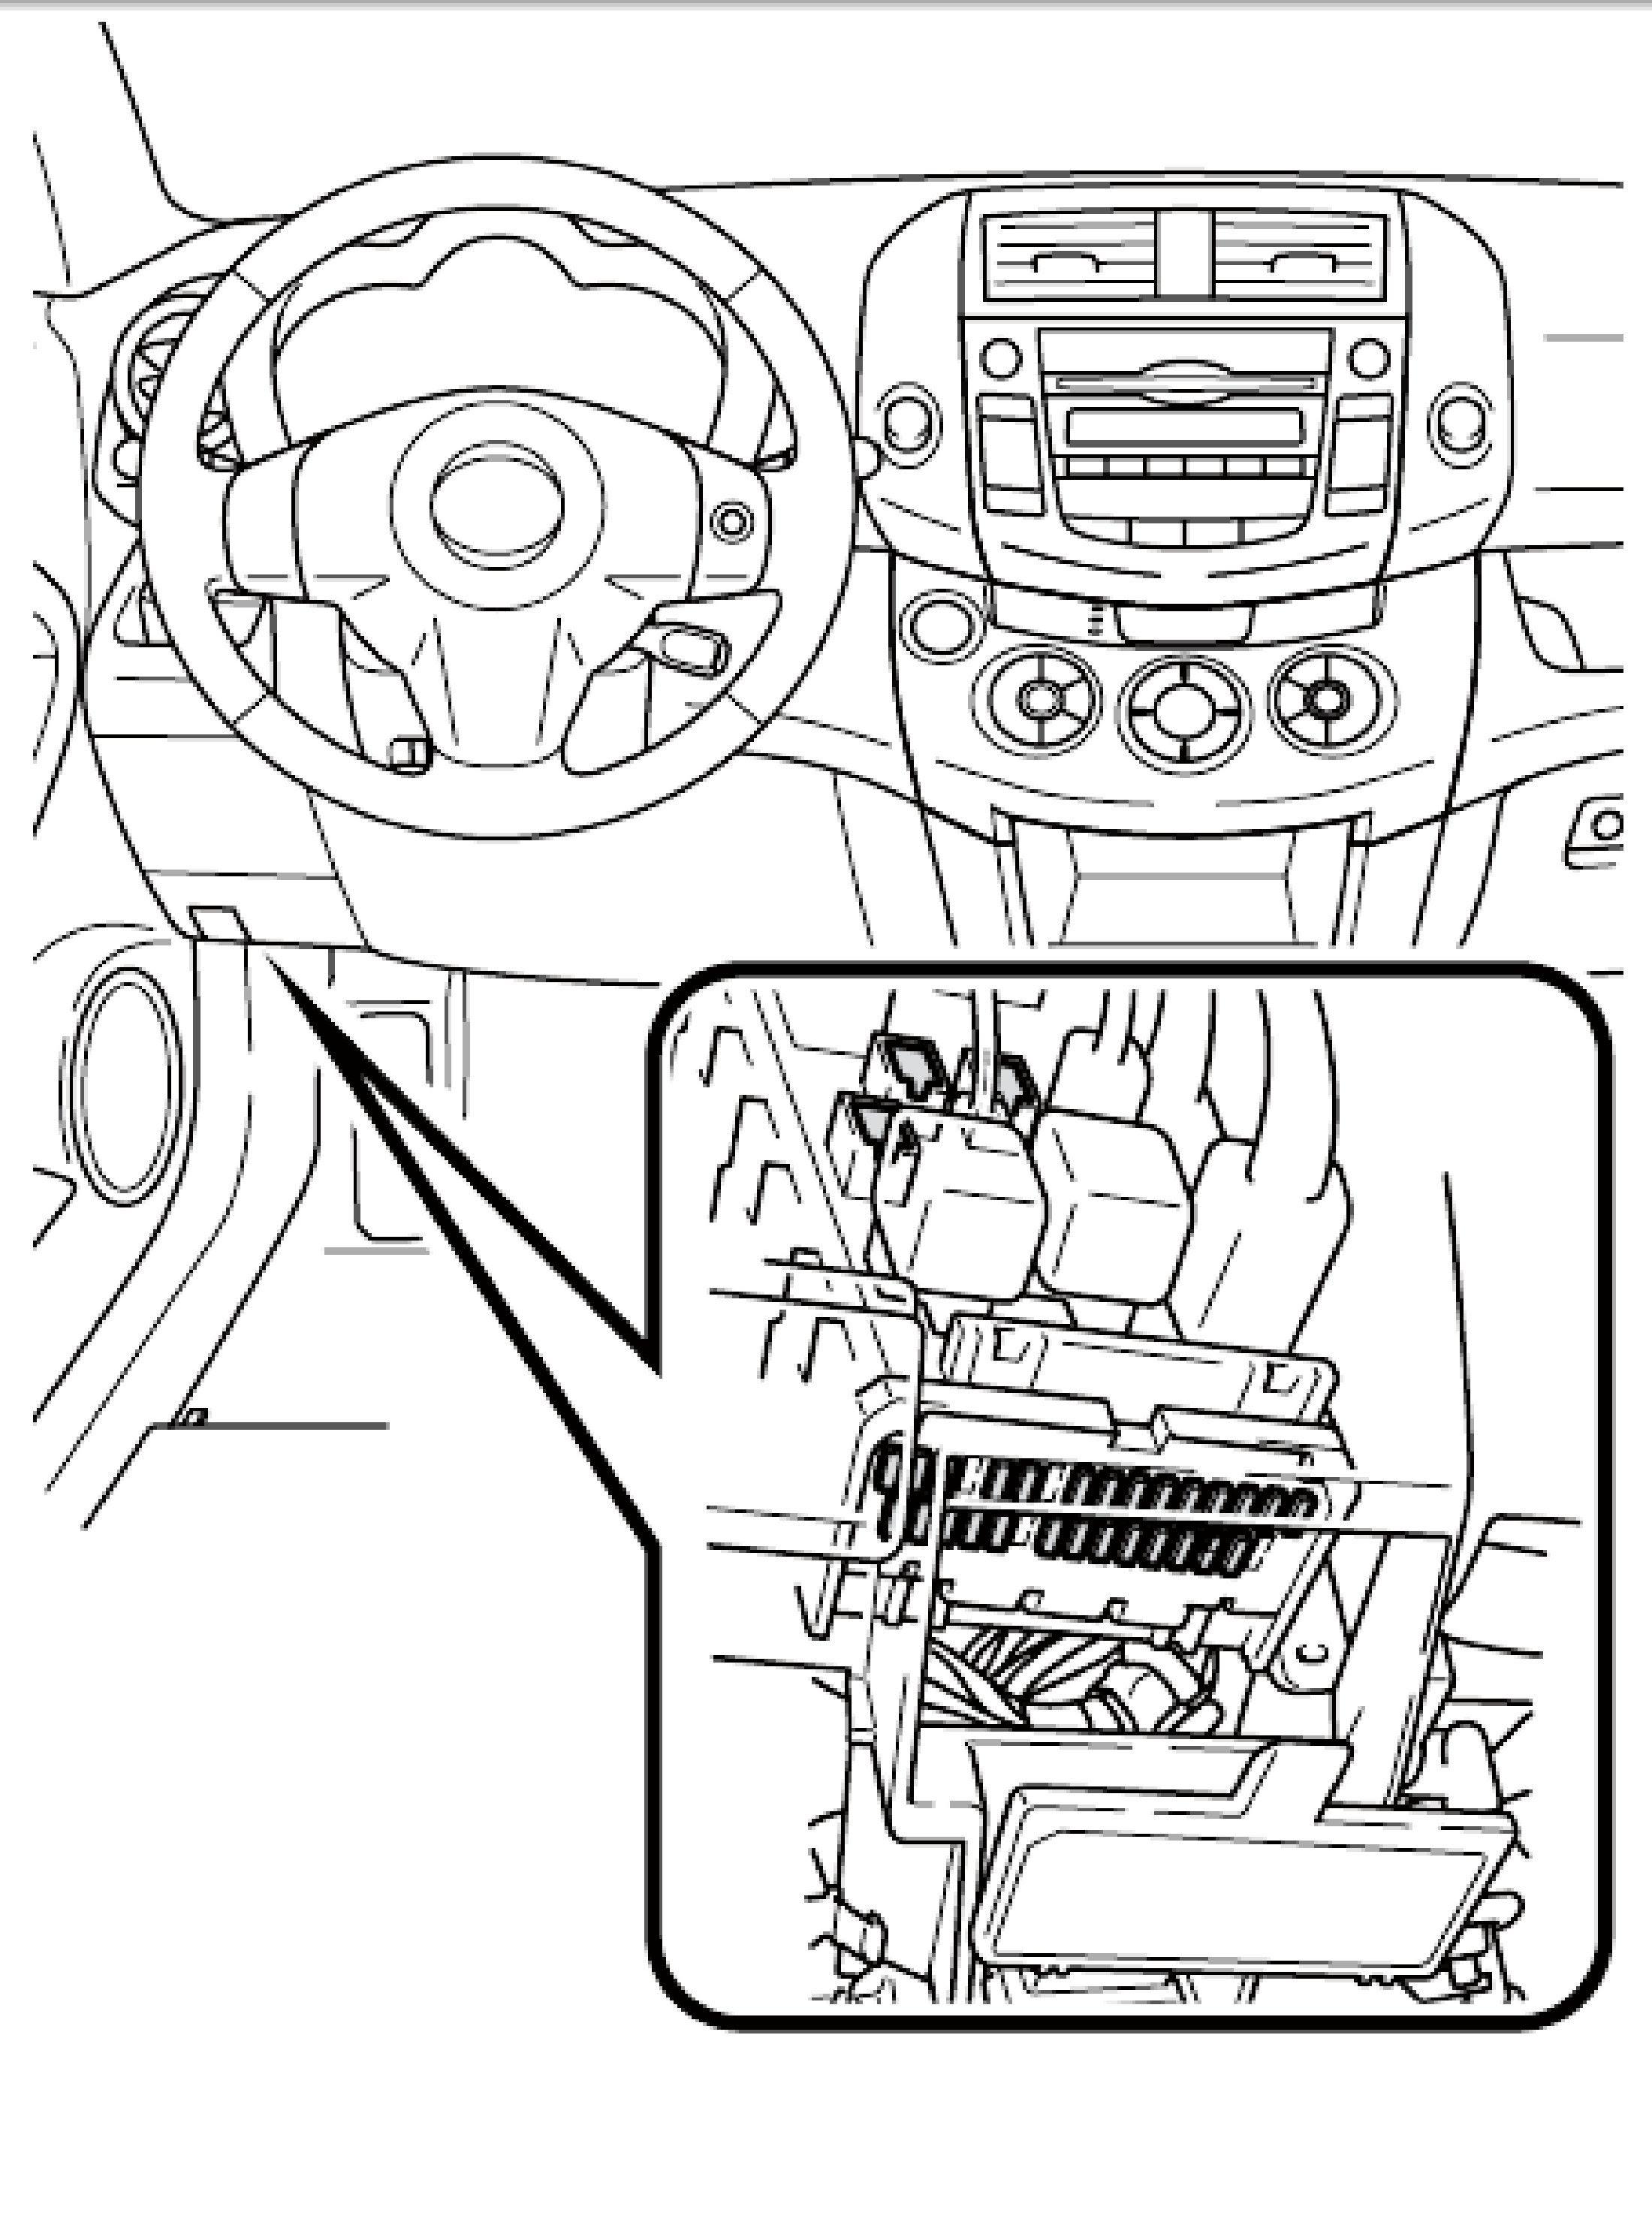 Rav4 Engine Diagram